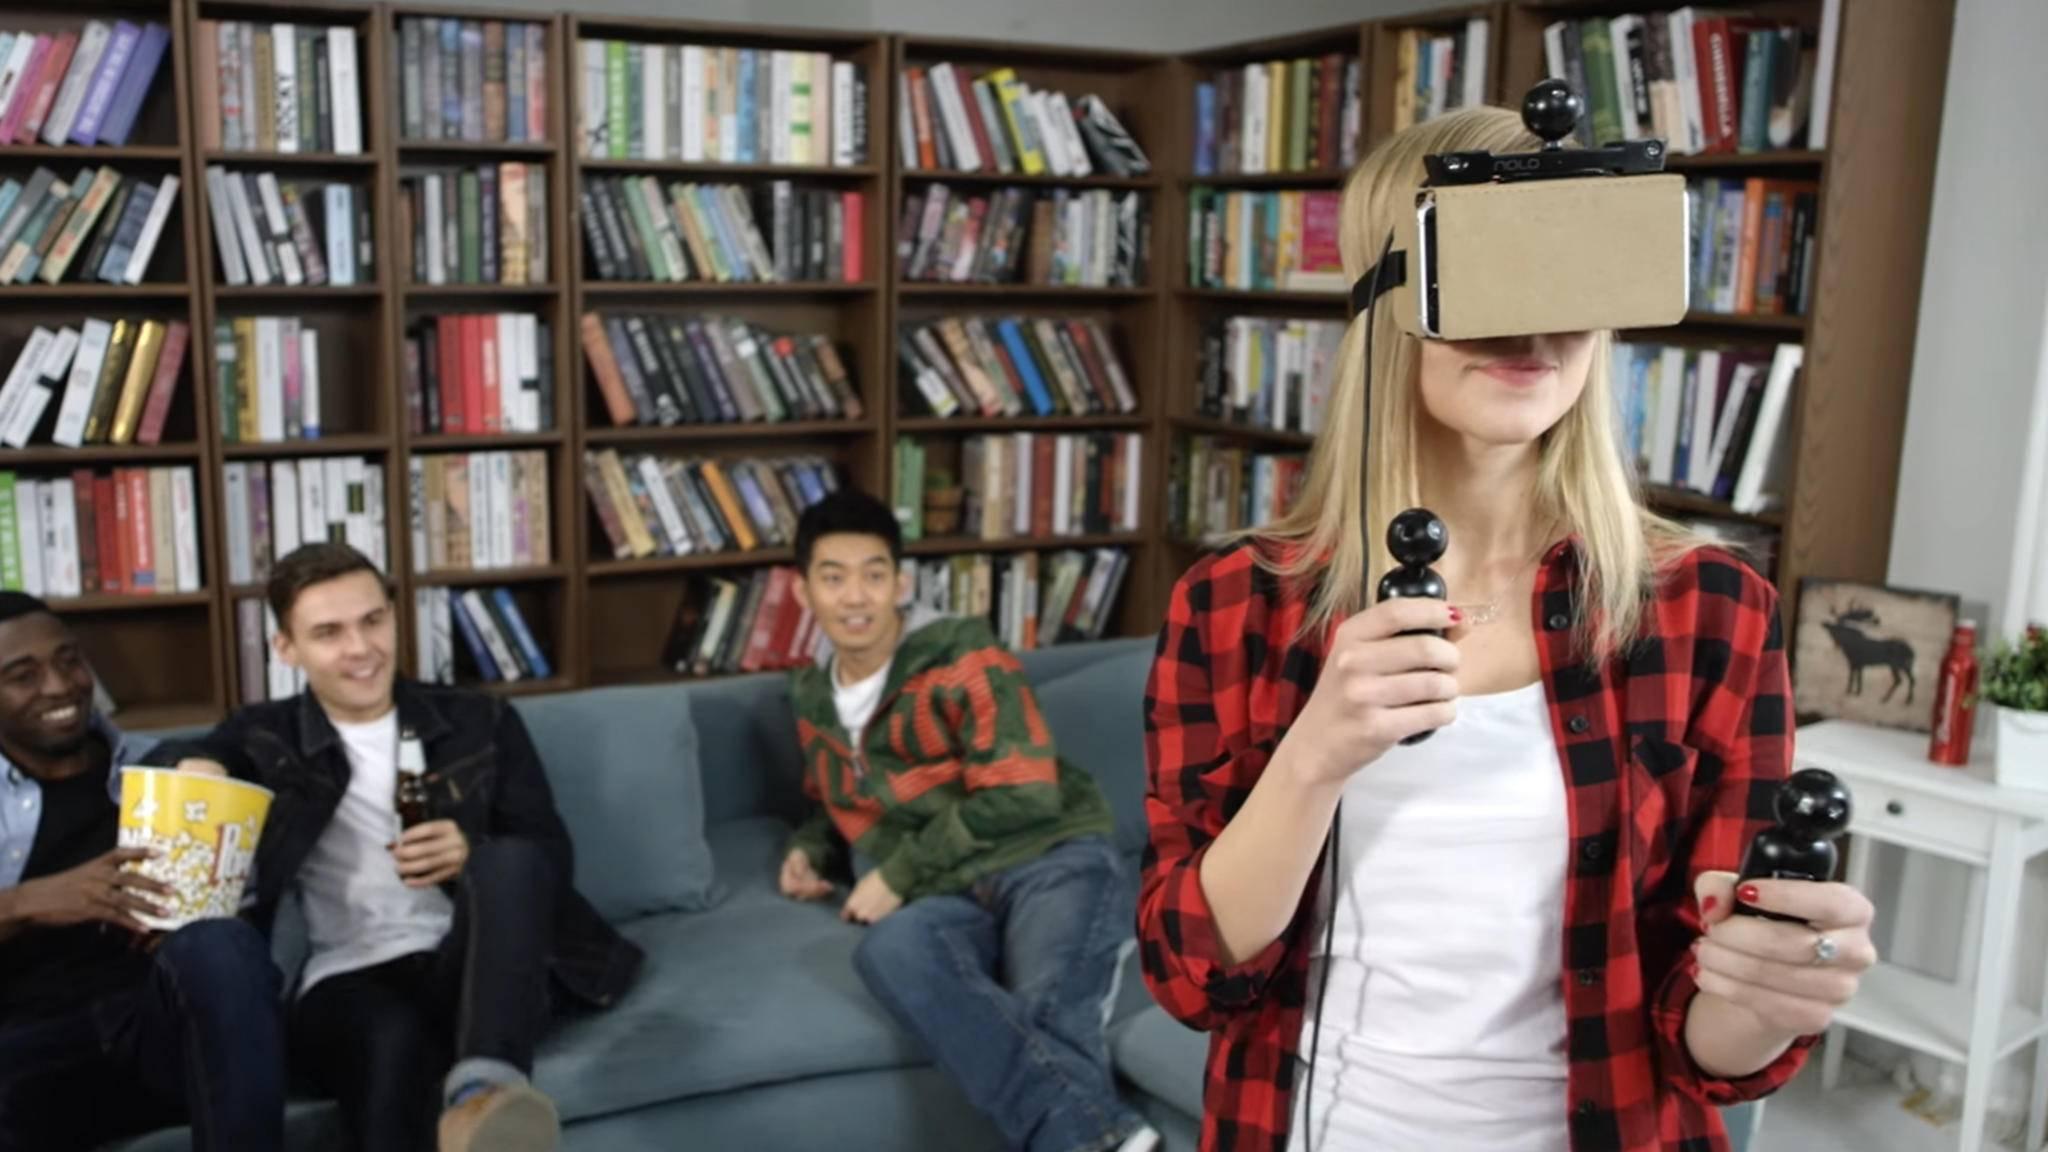 Mit NOLO VR kann man Virtual Reality-Spiele erleben.